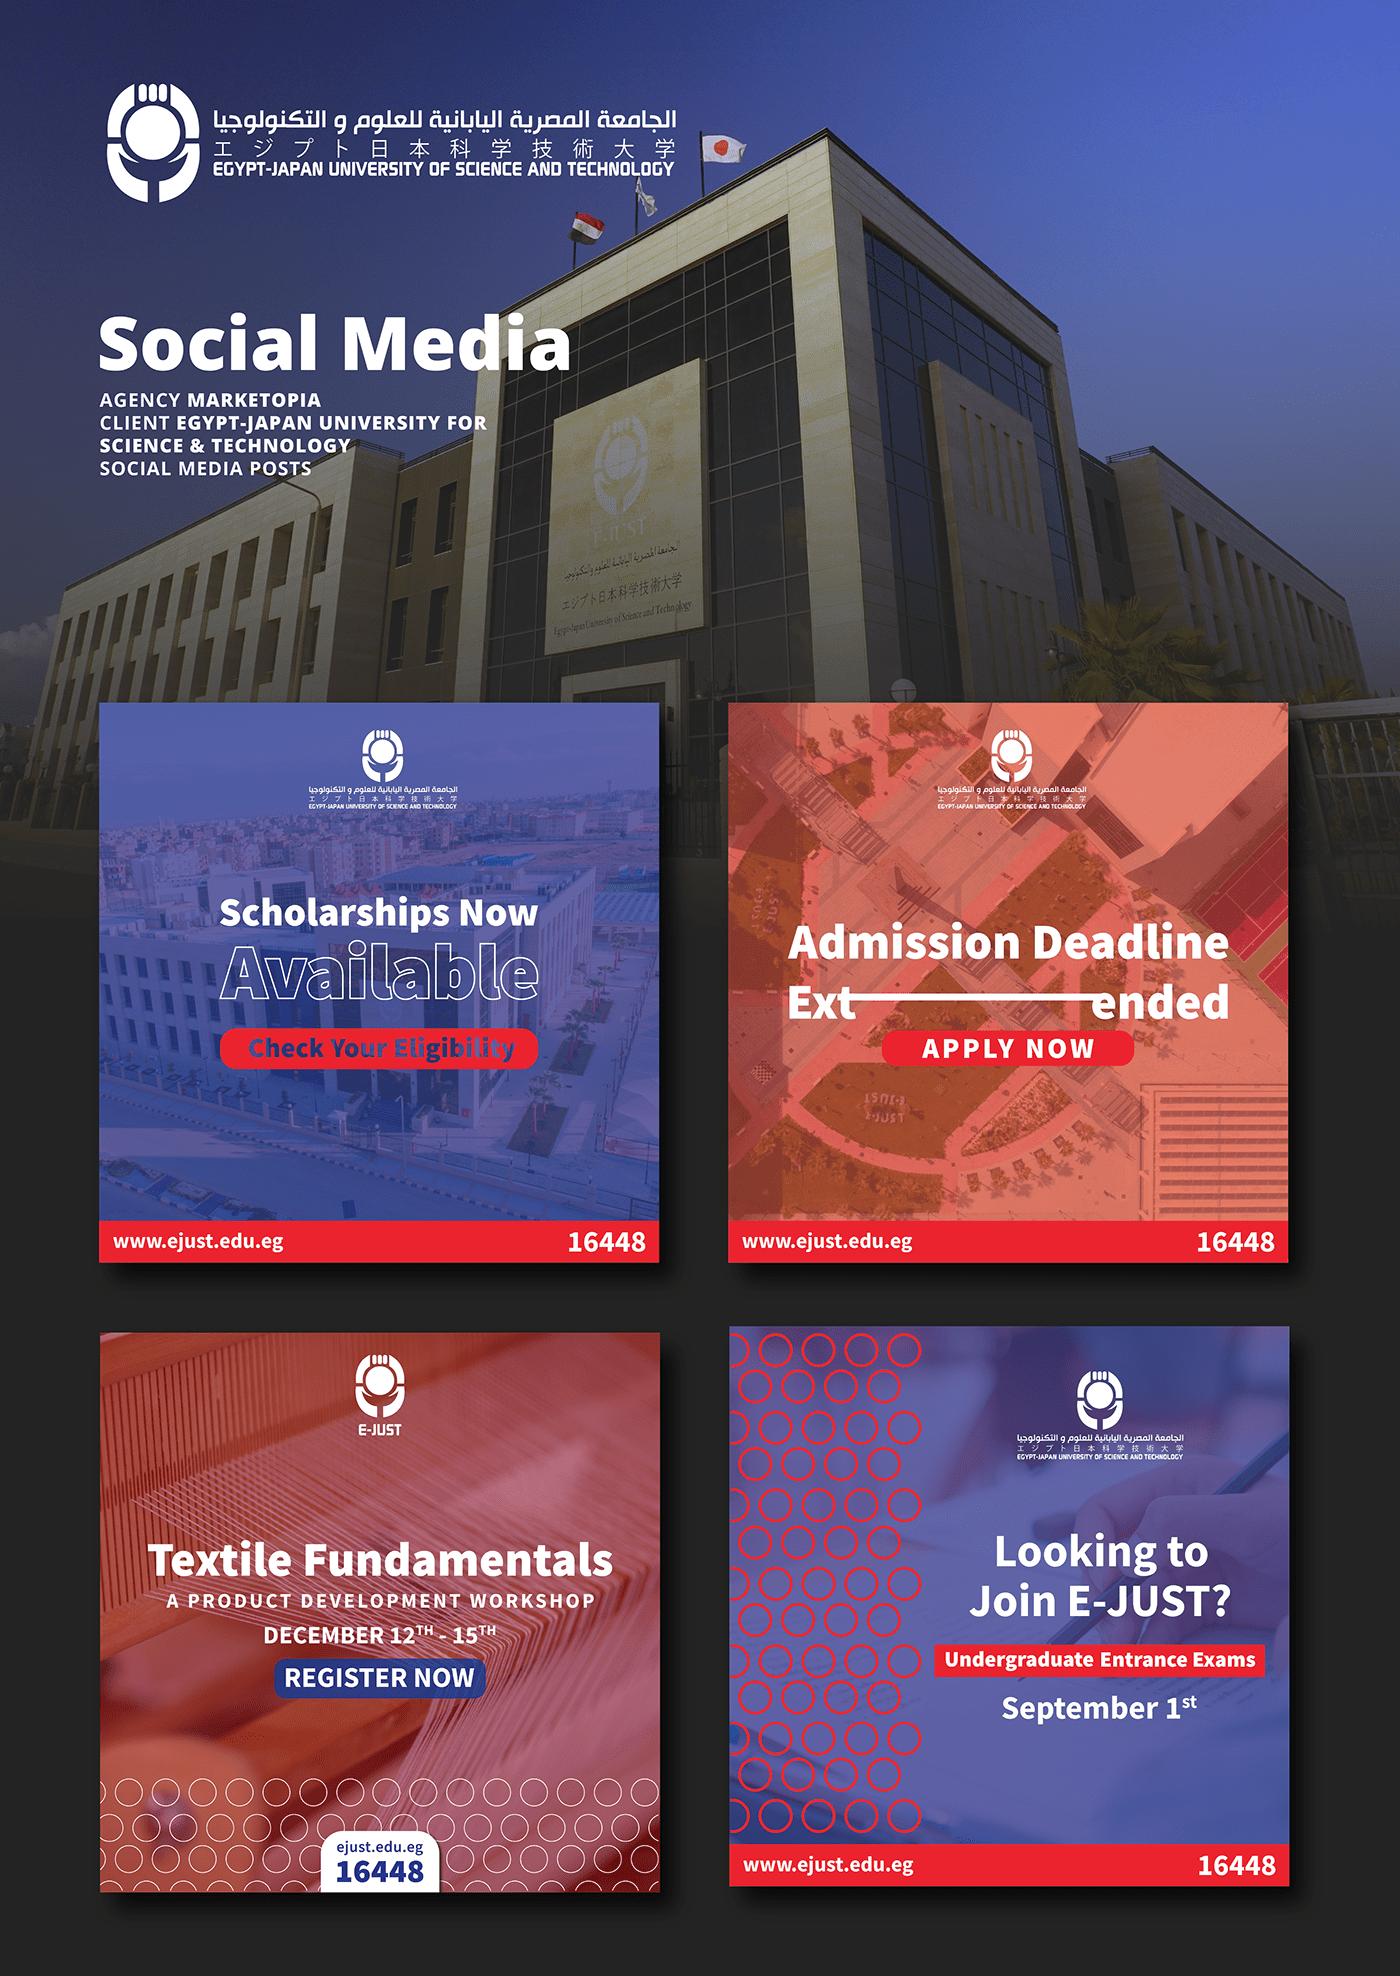 blue posts circle identity egypt Facebook Posts japan red posts social media University